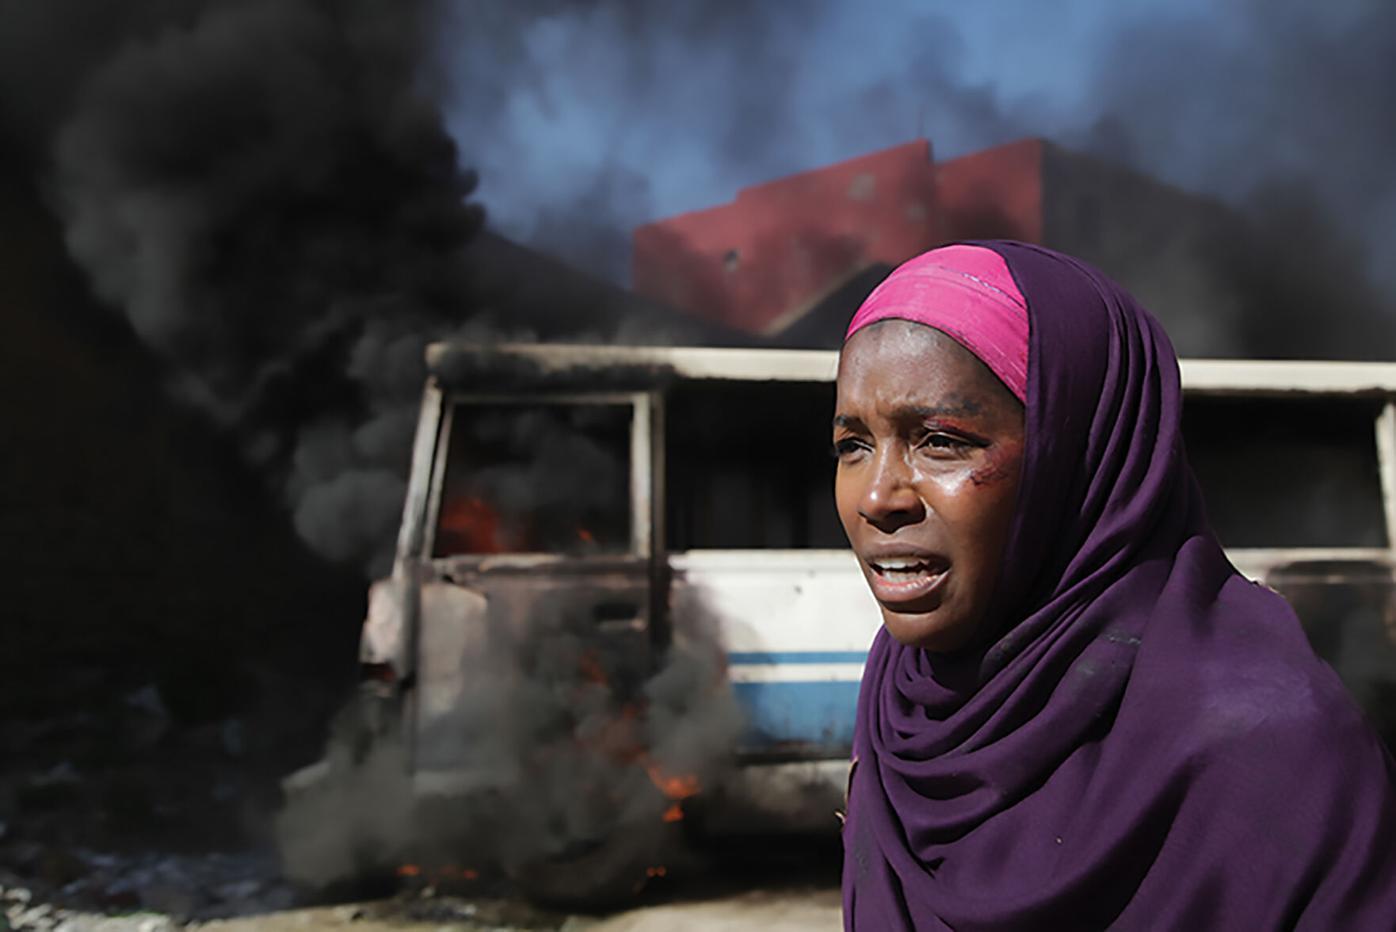 20-07-24 Family of Woman Mogadishu 1.jpg